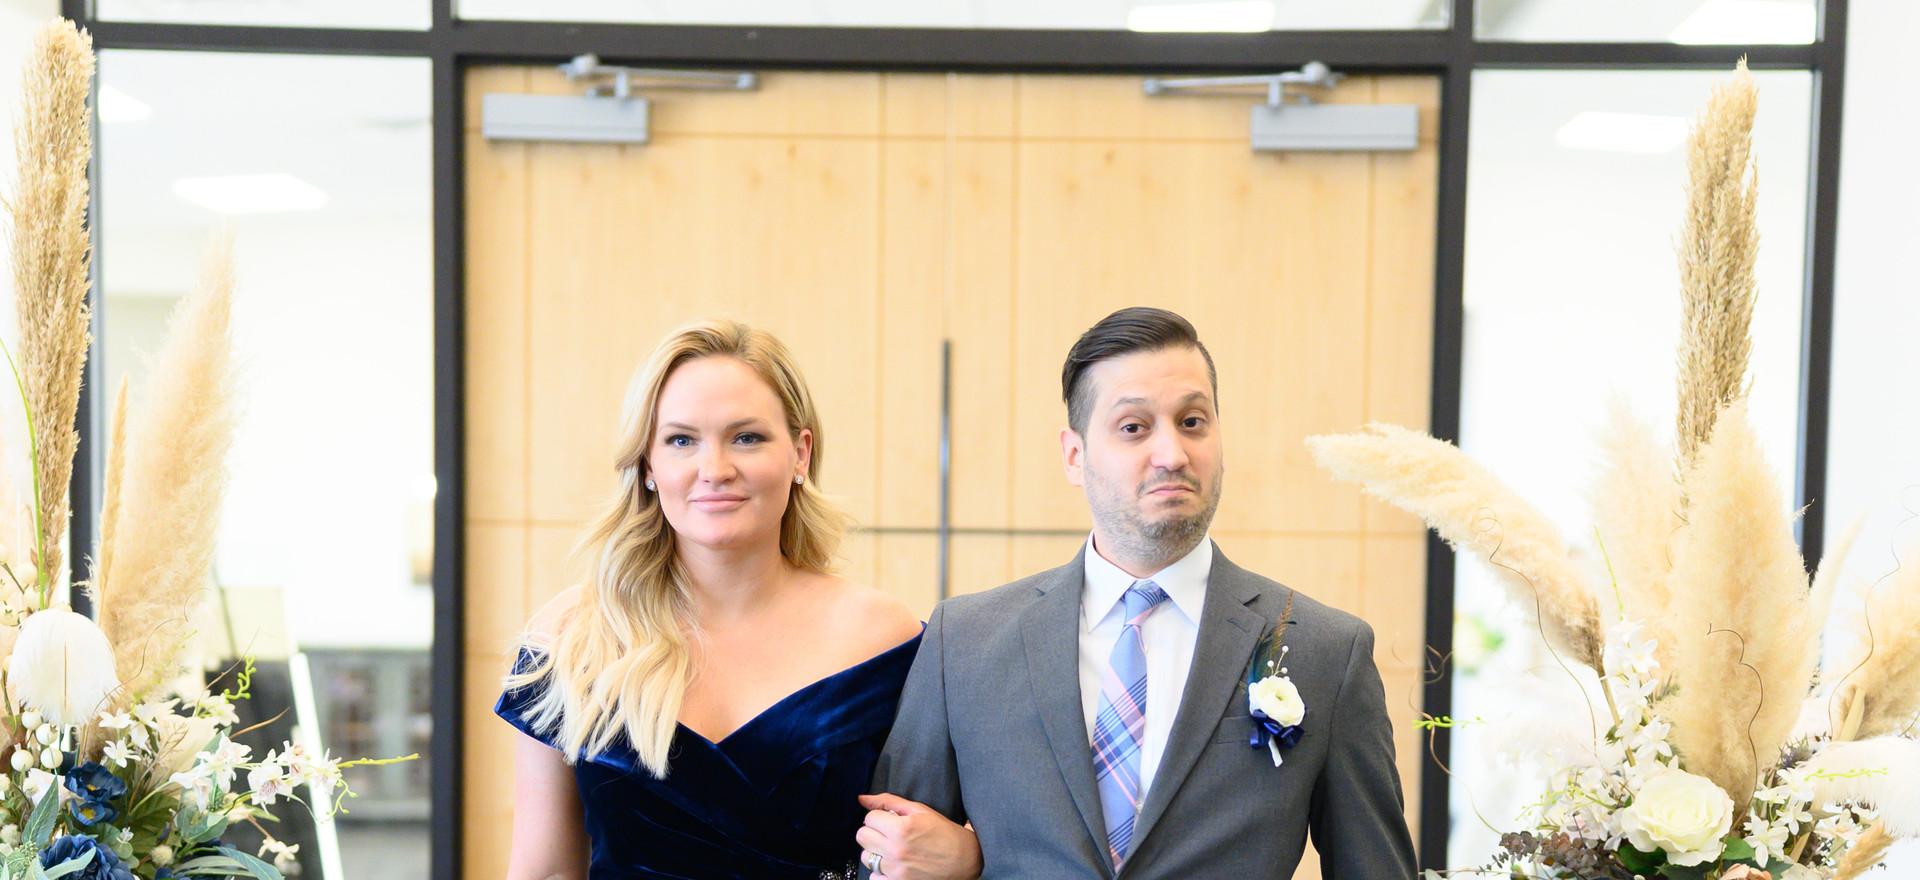 050_Lorena and Mike's Wedding day.jpg